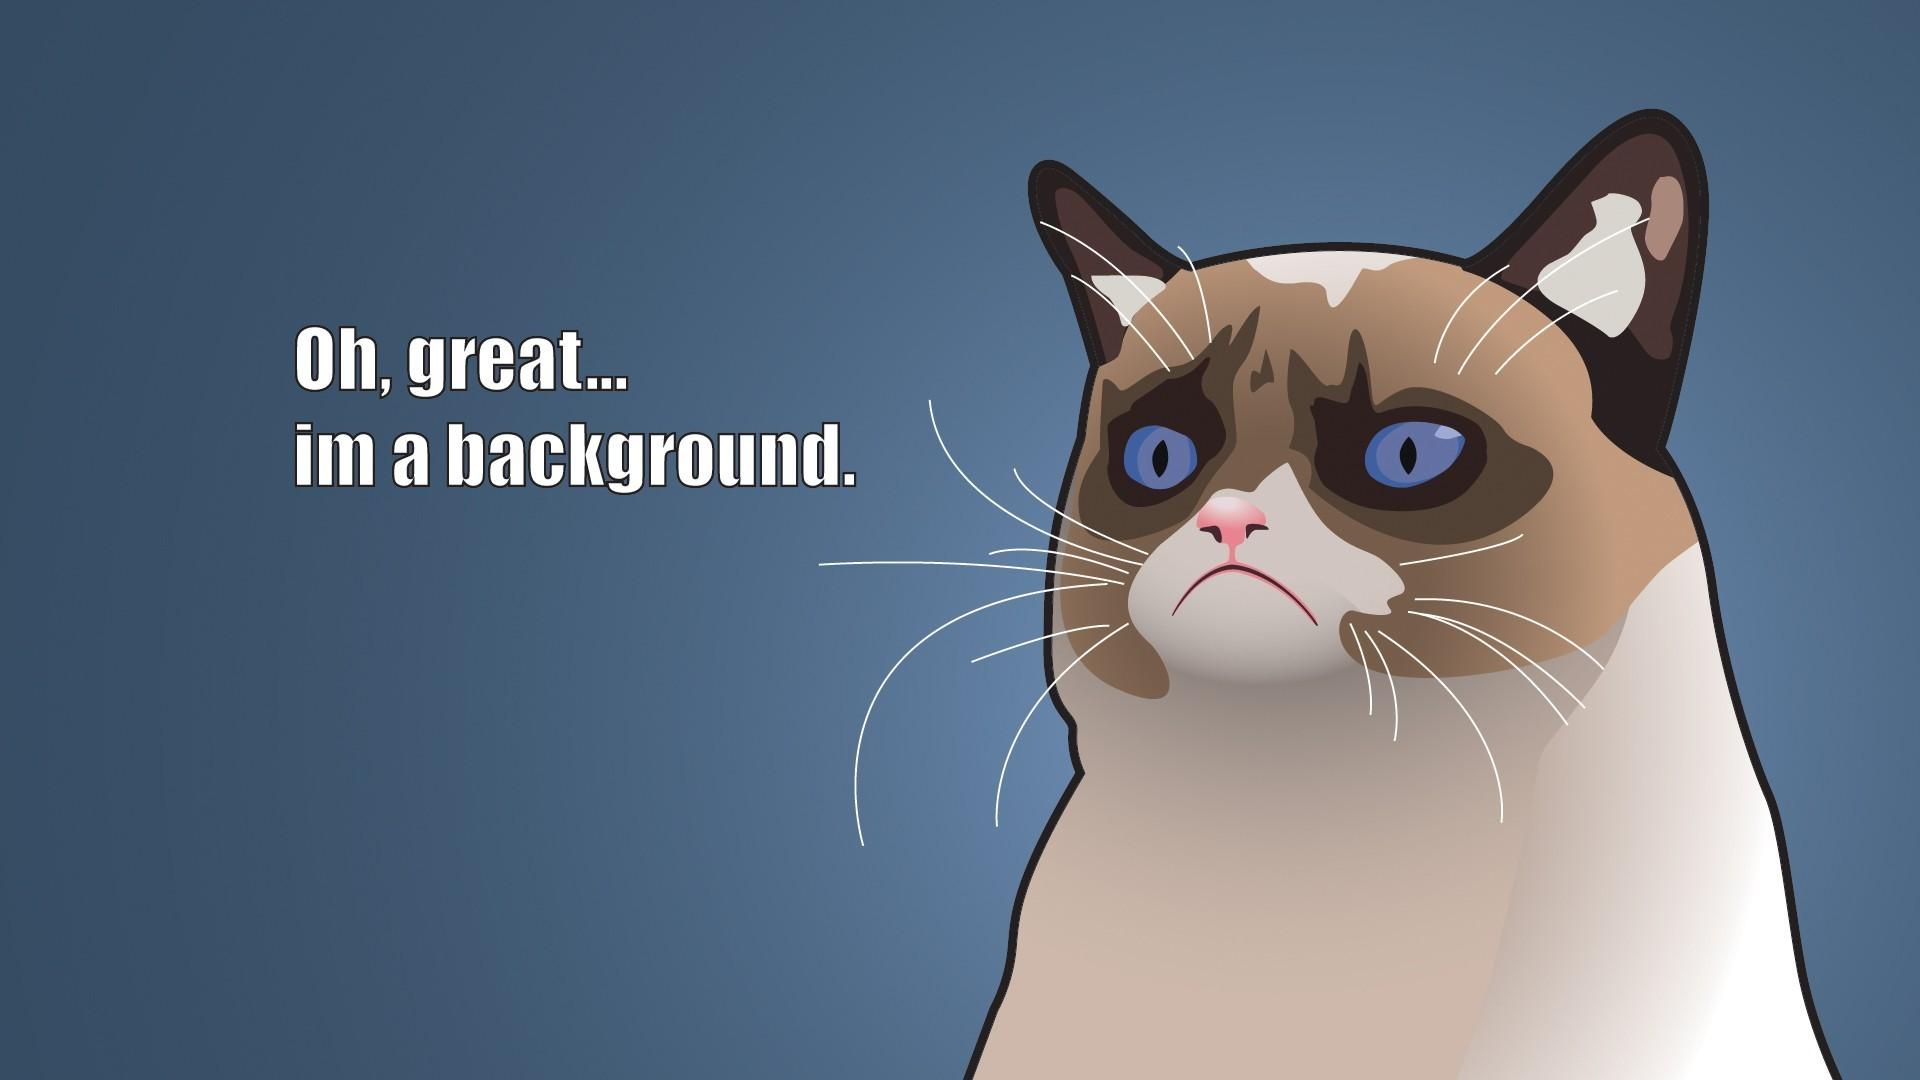 Funny birthday wallpaper | backgrounds | Pinterest | Birthday wallpaper